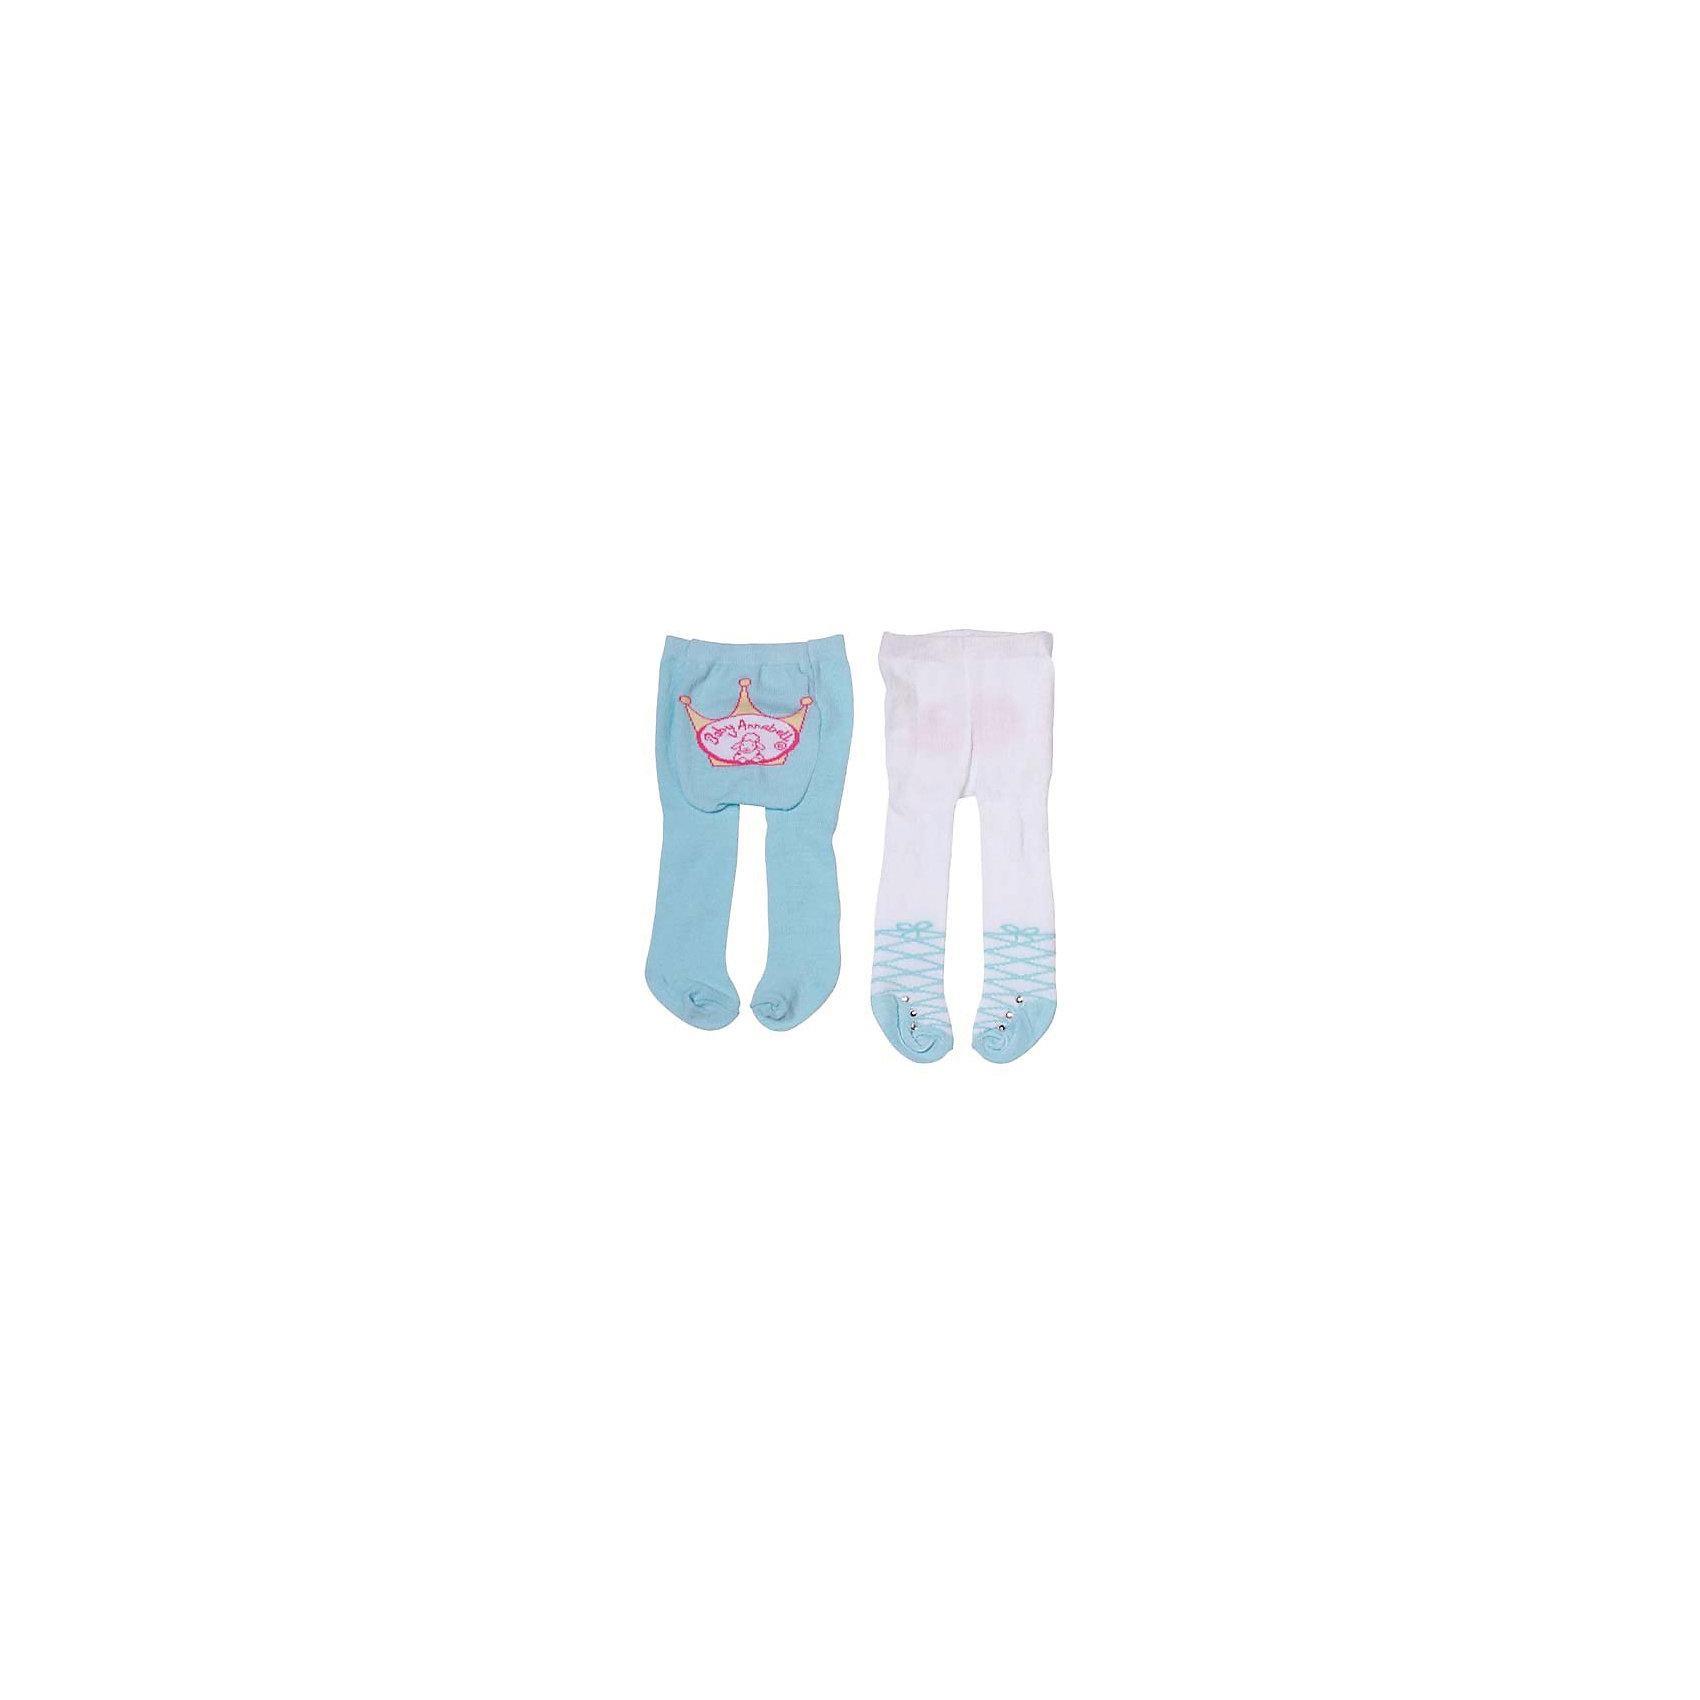 Zapf Creation Колготки 2 пары, голубые, Baby Annabell компрессионые колготки 2 класса купить